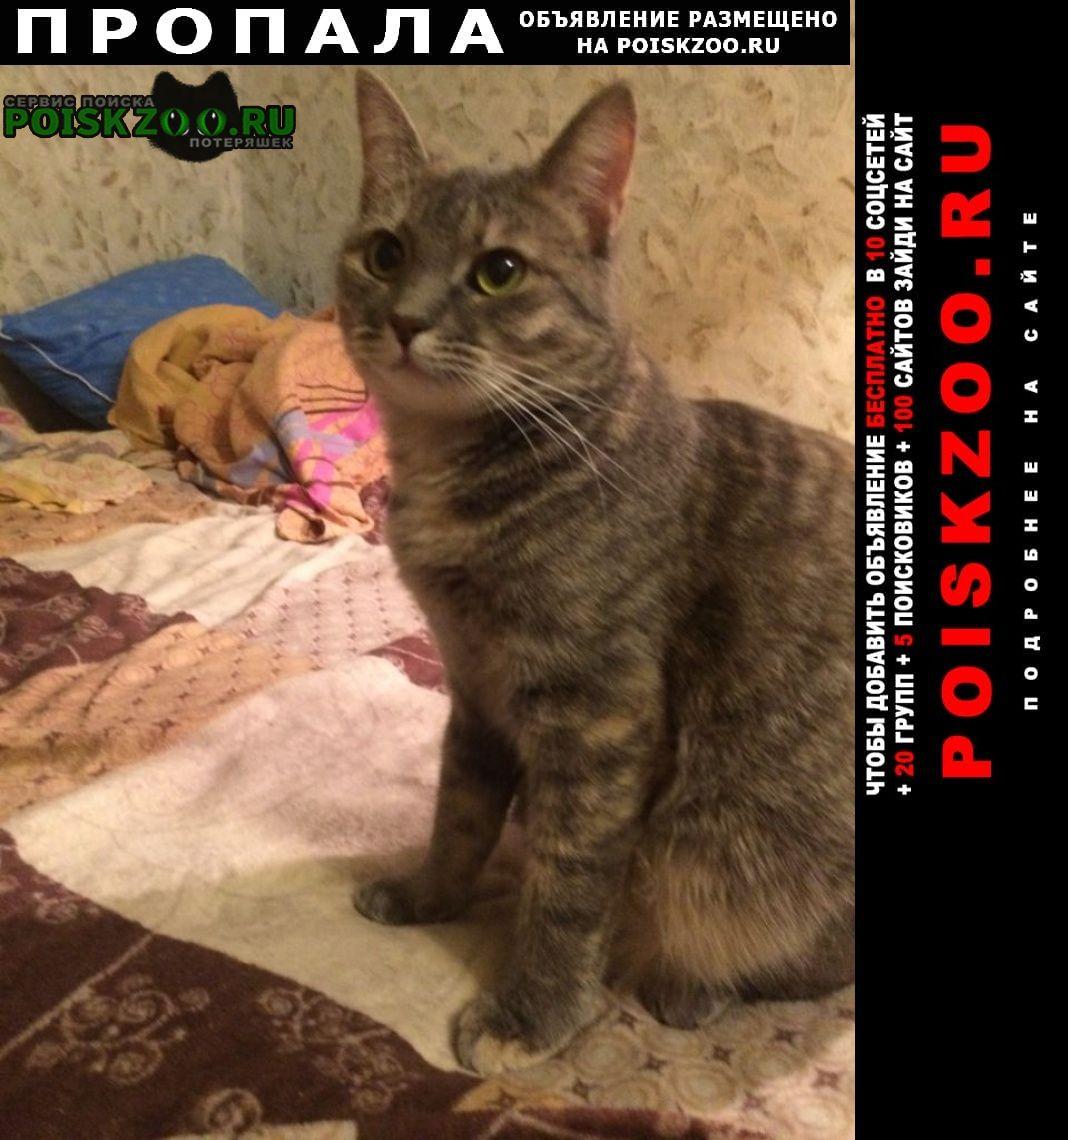 Тверь Пропала кошка помогите найти кошку мурку